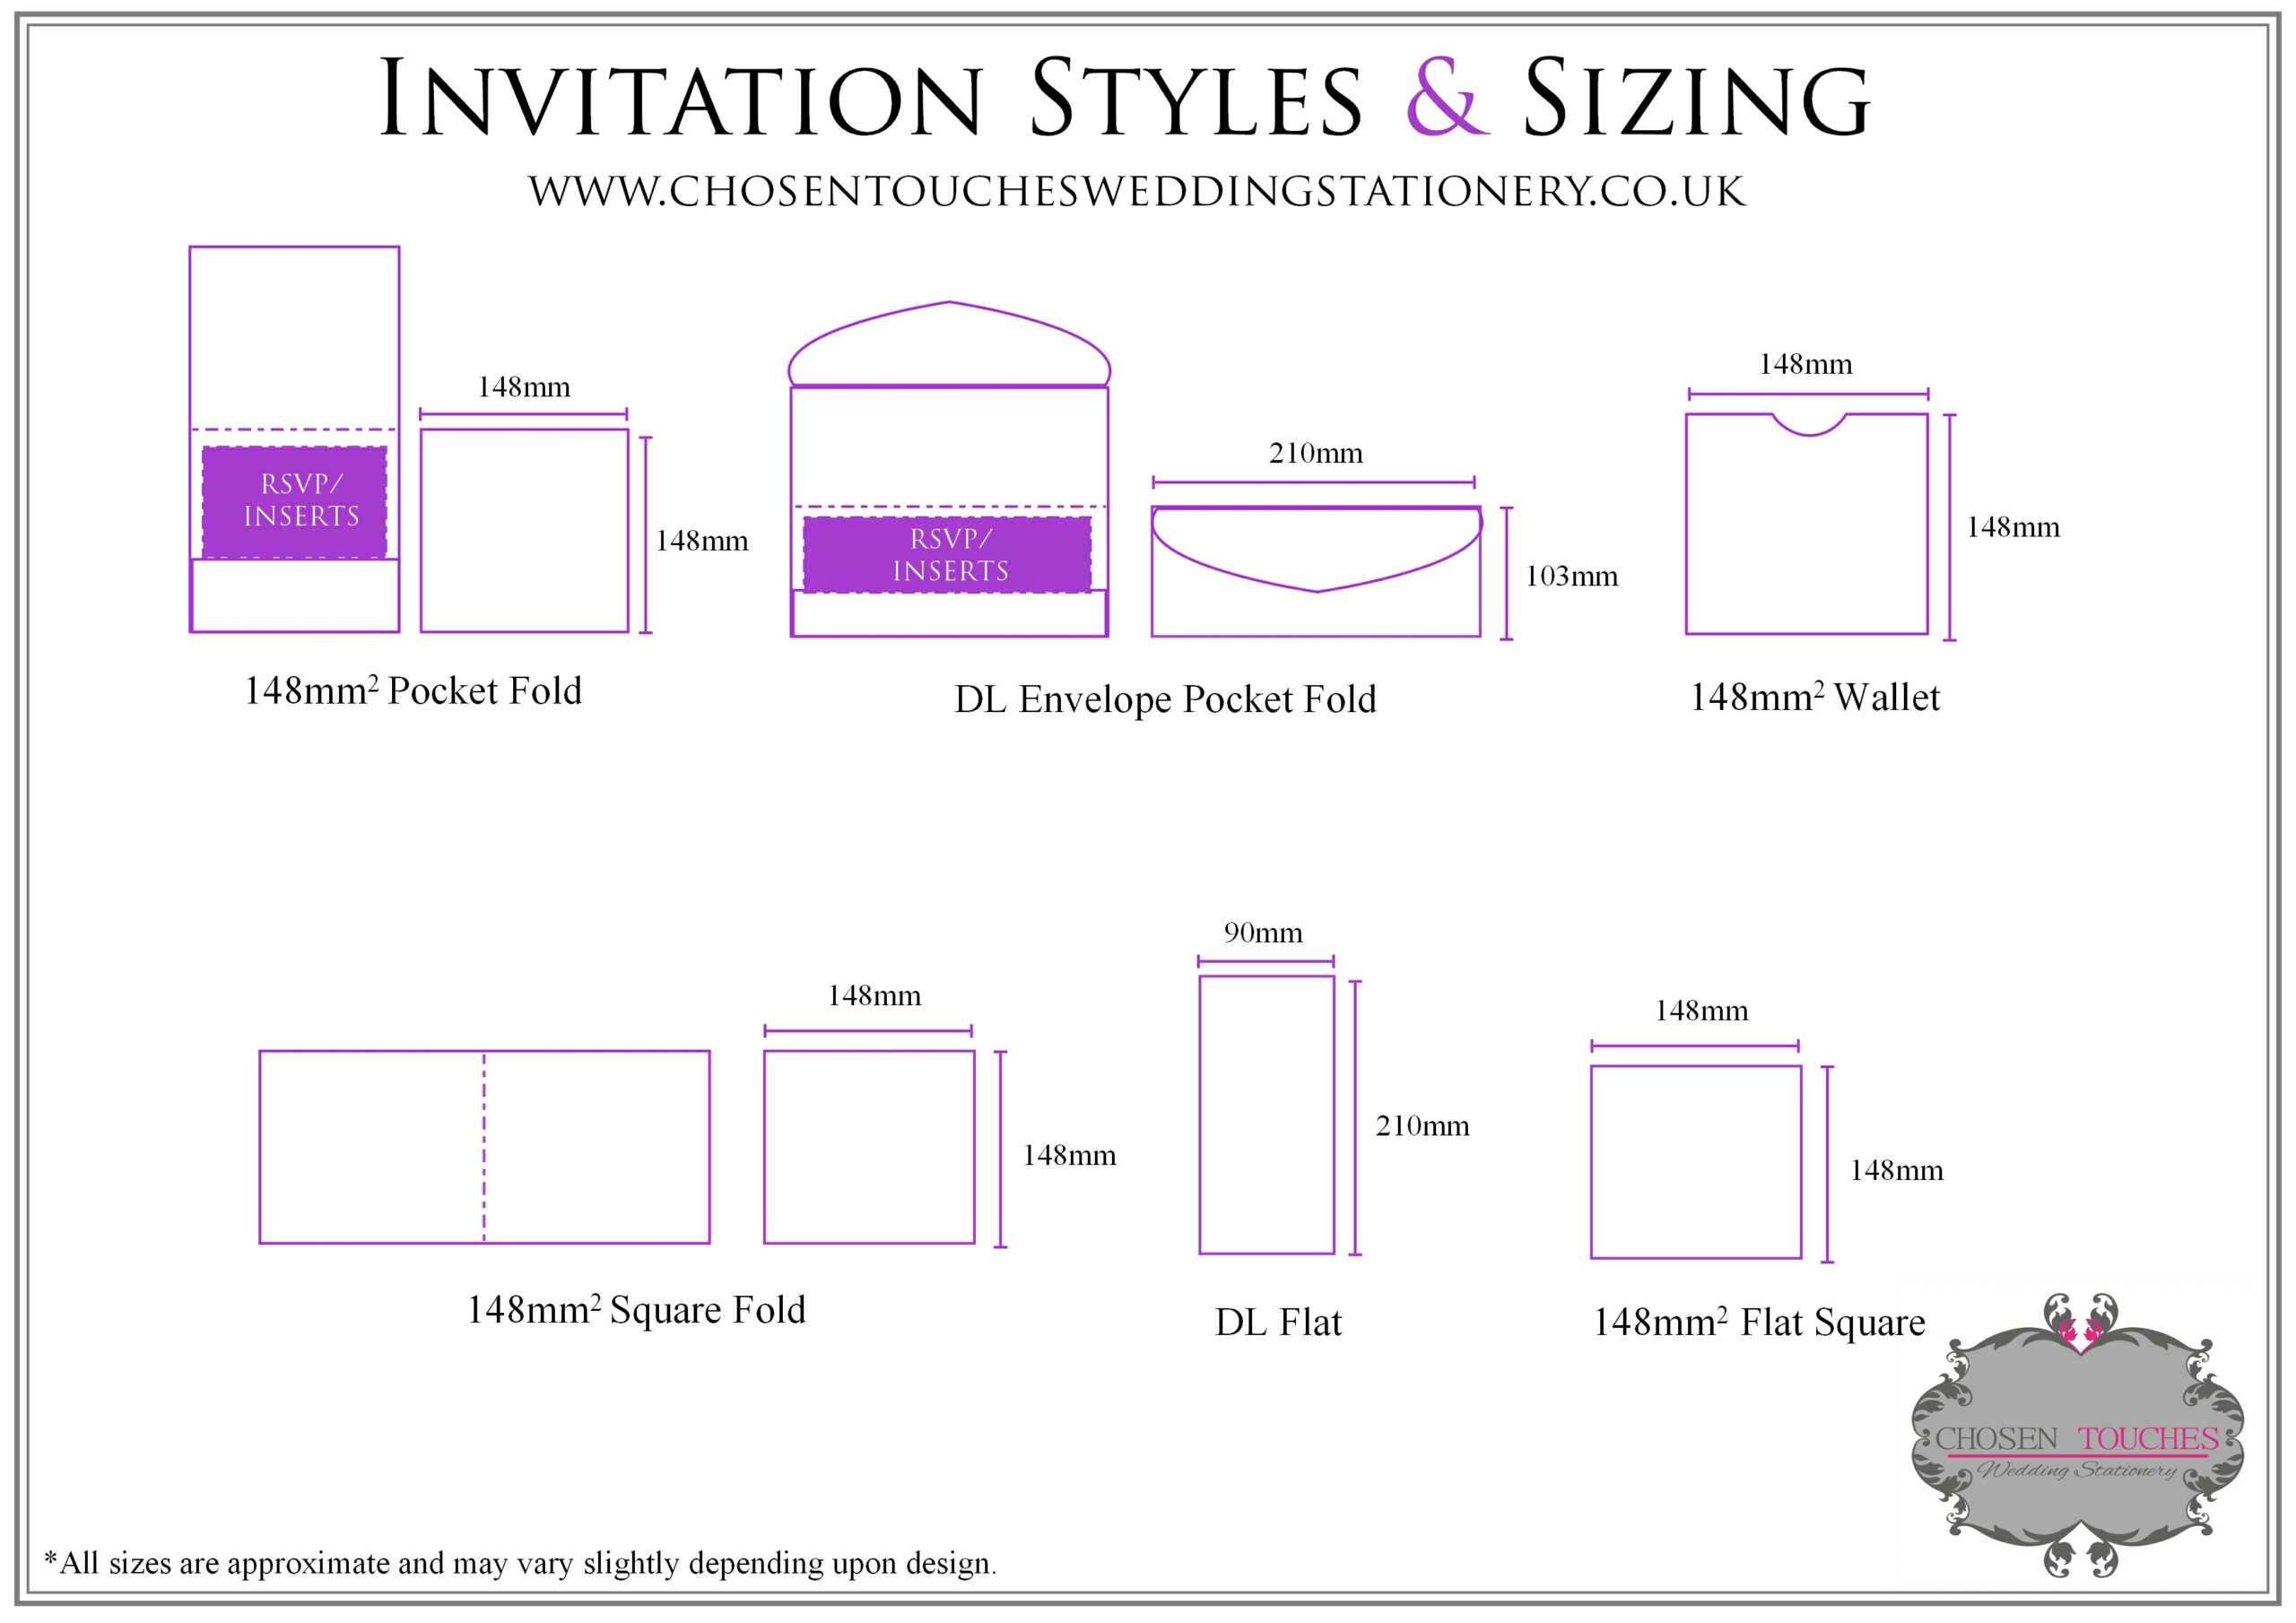 Rsvp Envelope Size Chart - Duna.digitalfuturesconsortium Pertaining To Wedding Card Size Template